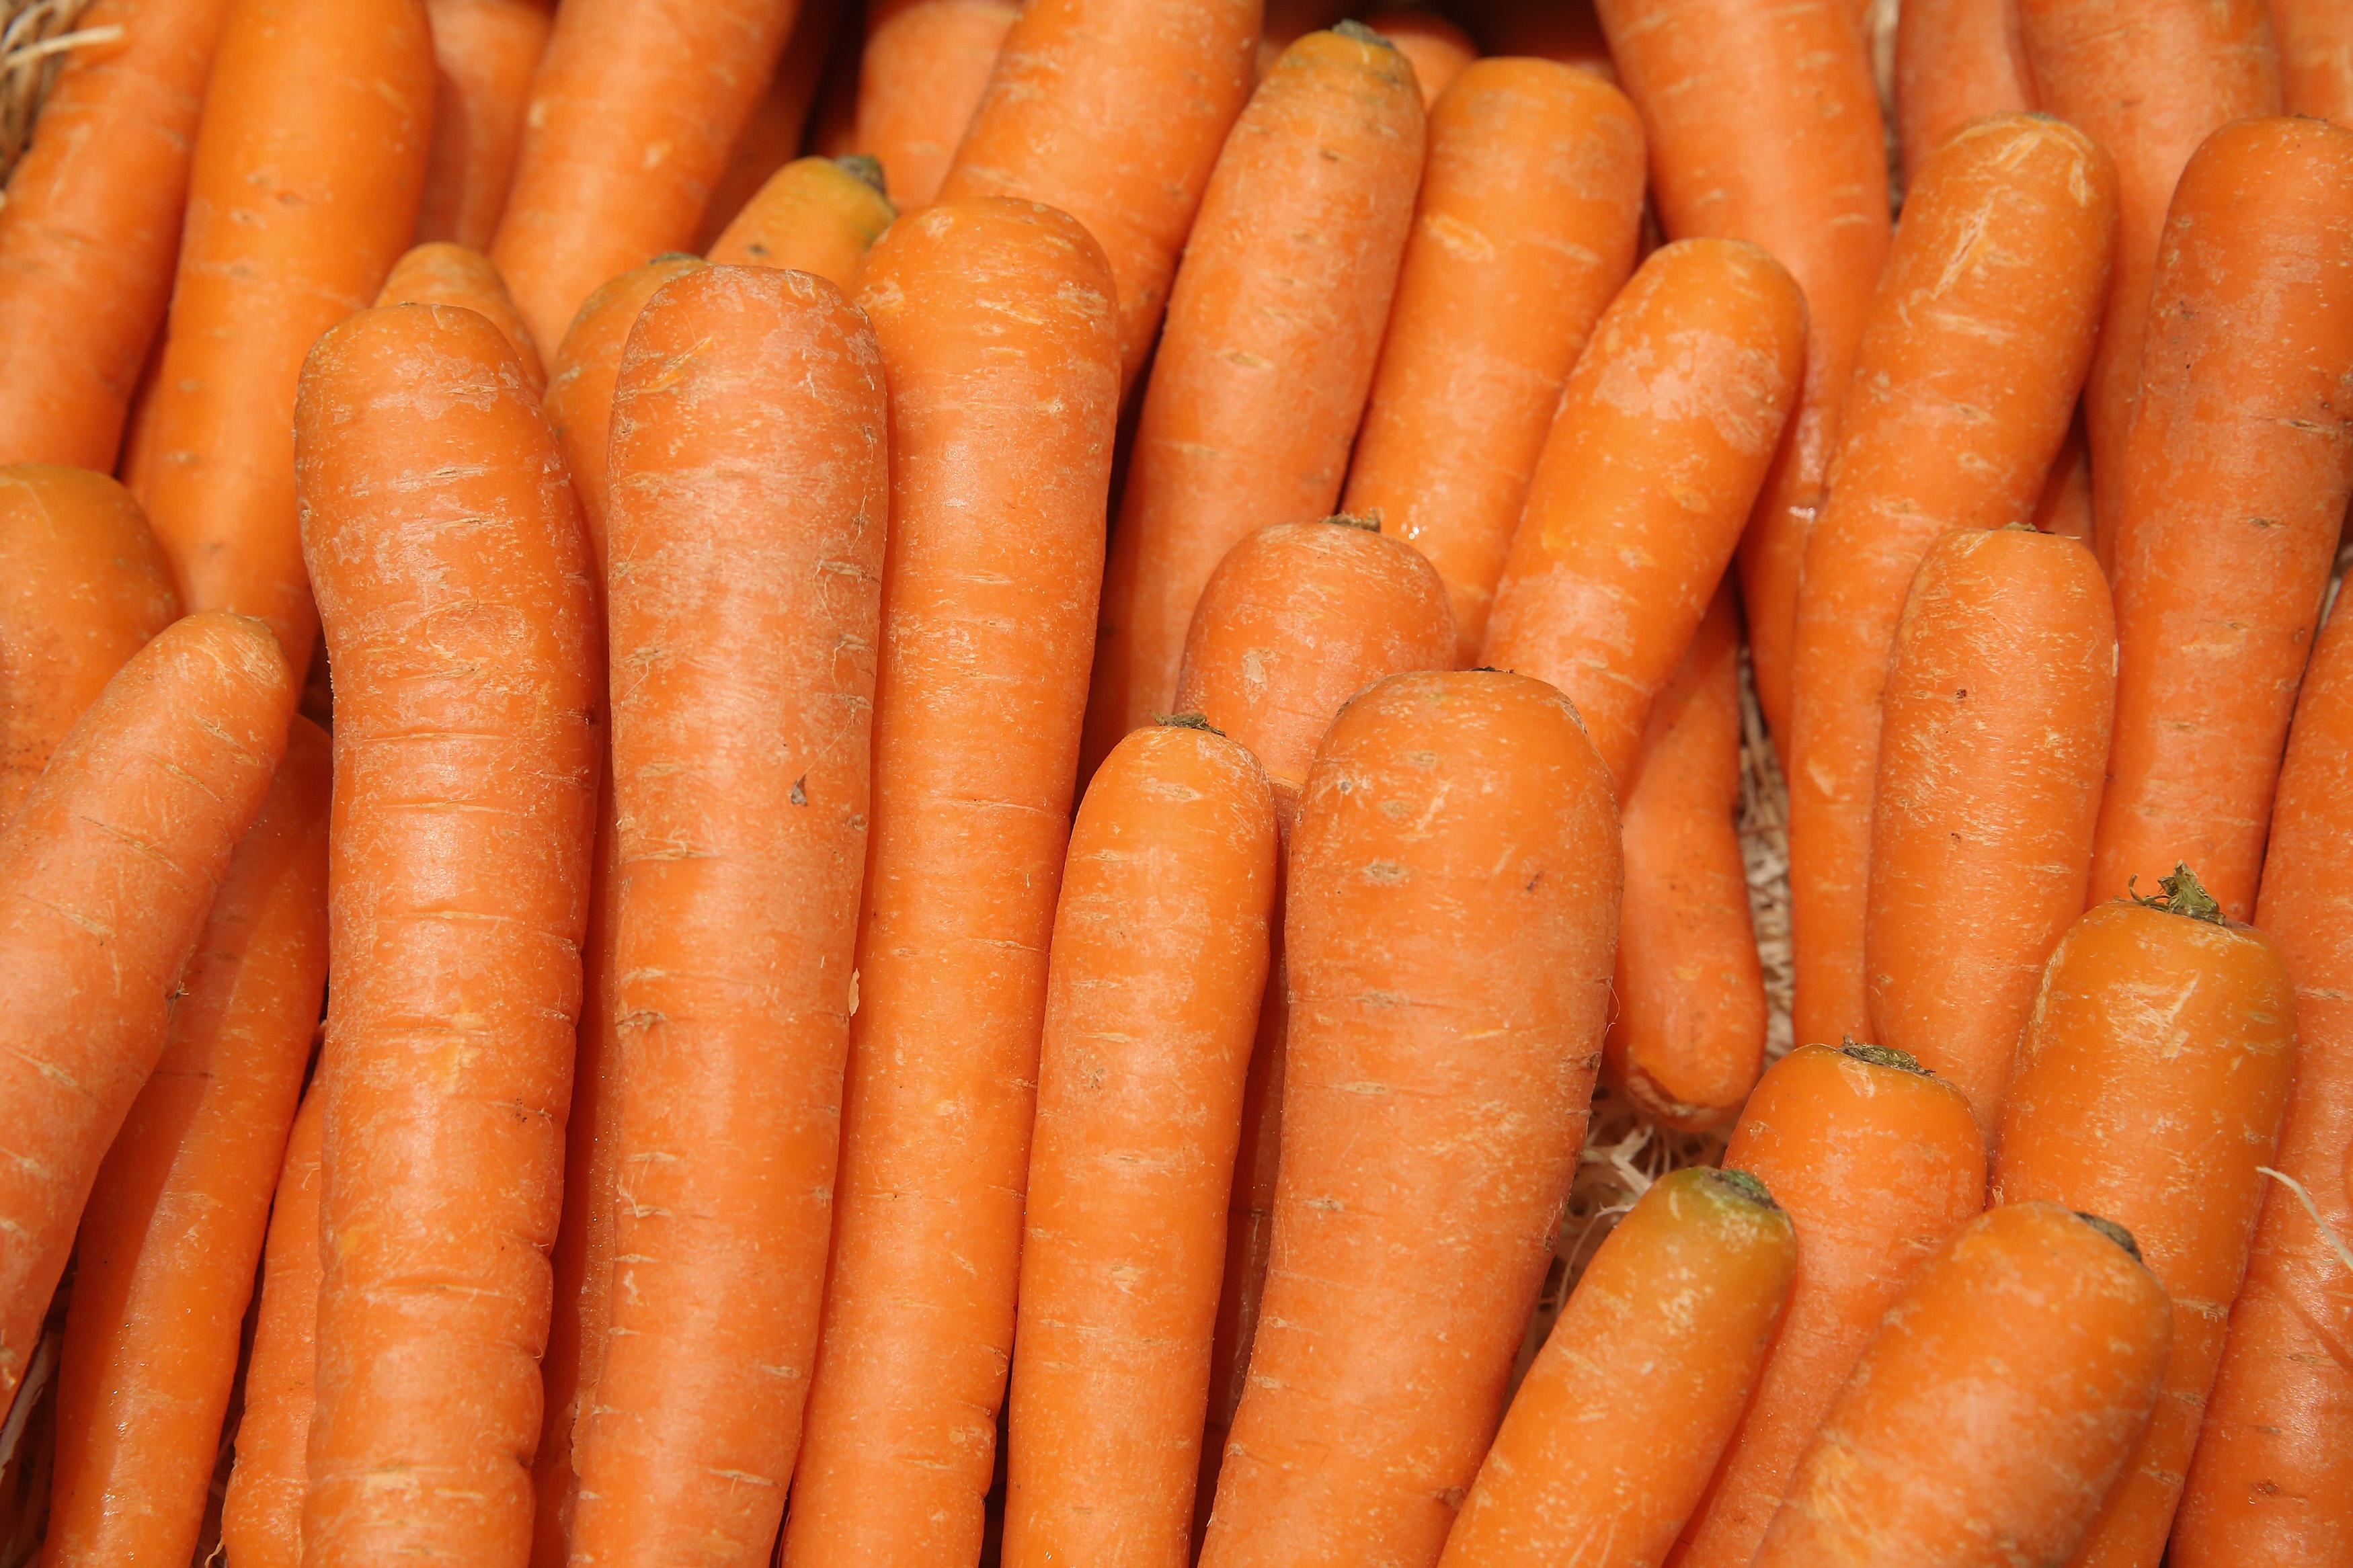 https://www.harpersbazaar.mx/belleza/propiedades-beneficios-jugo-de-frutas-naranja-zanahoria-toronja-arandano/